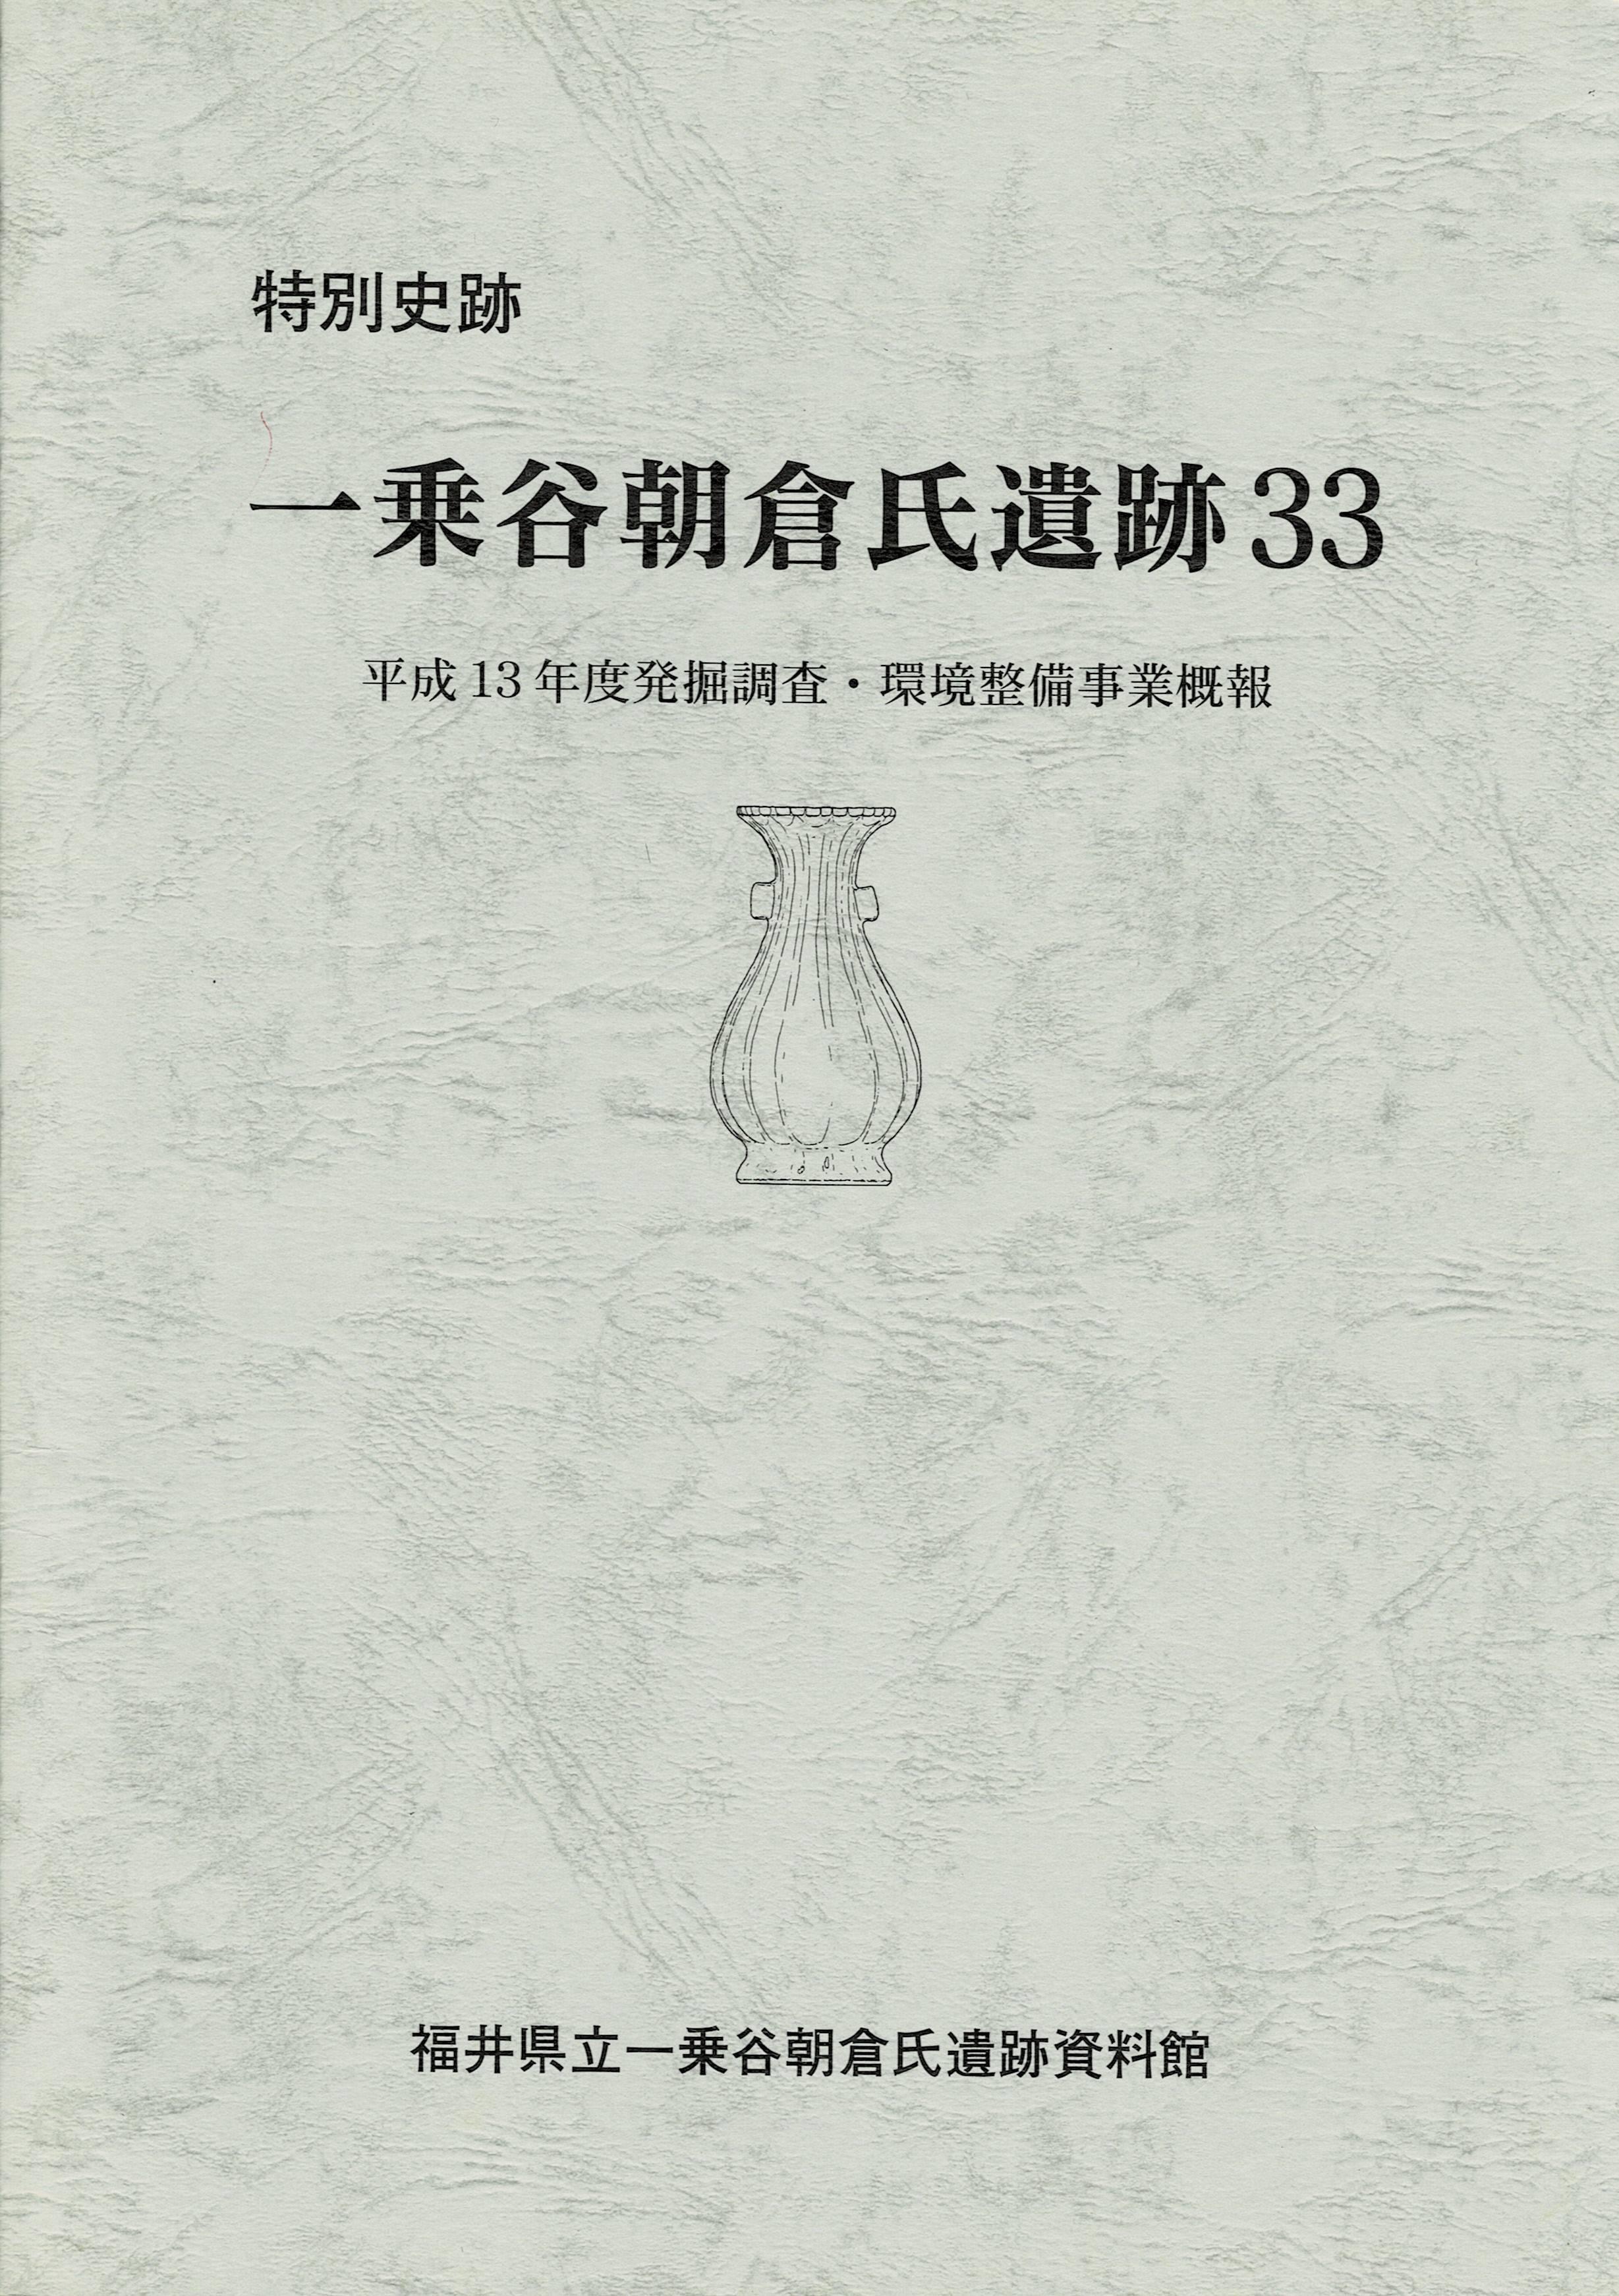 No.0329